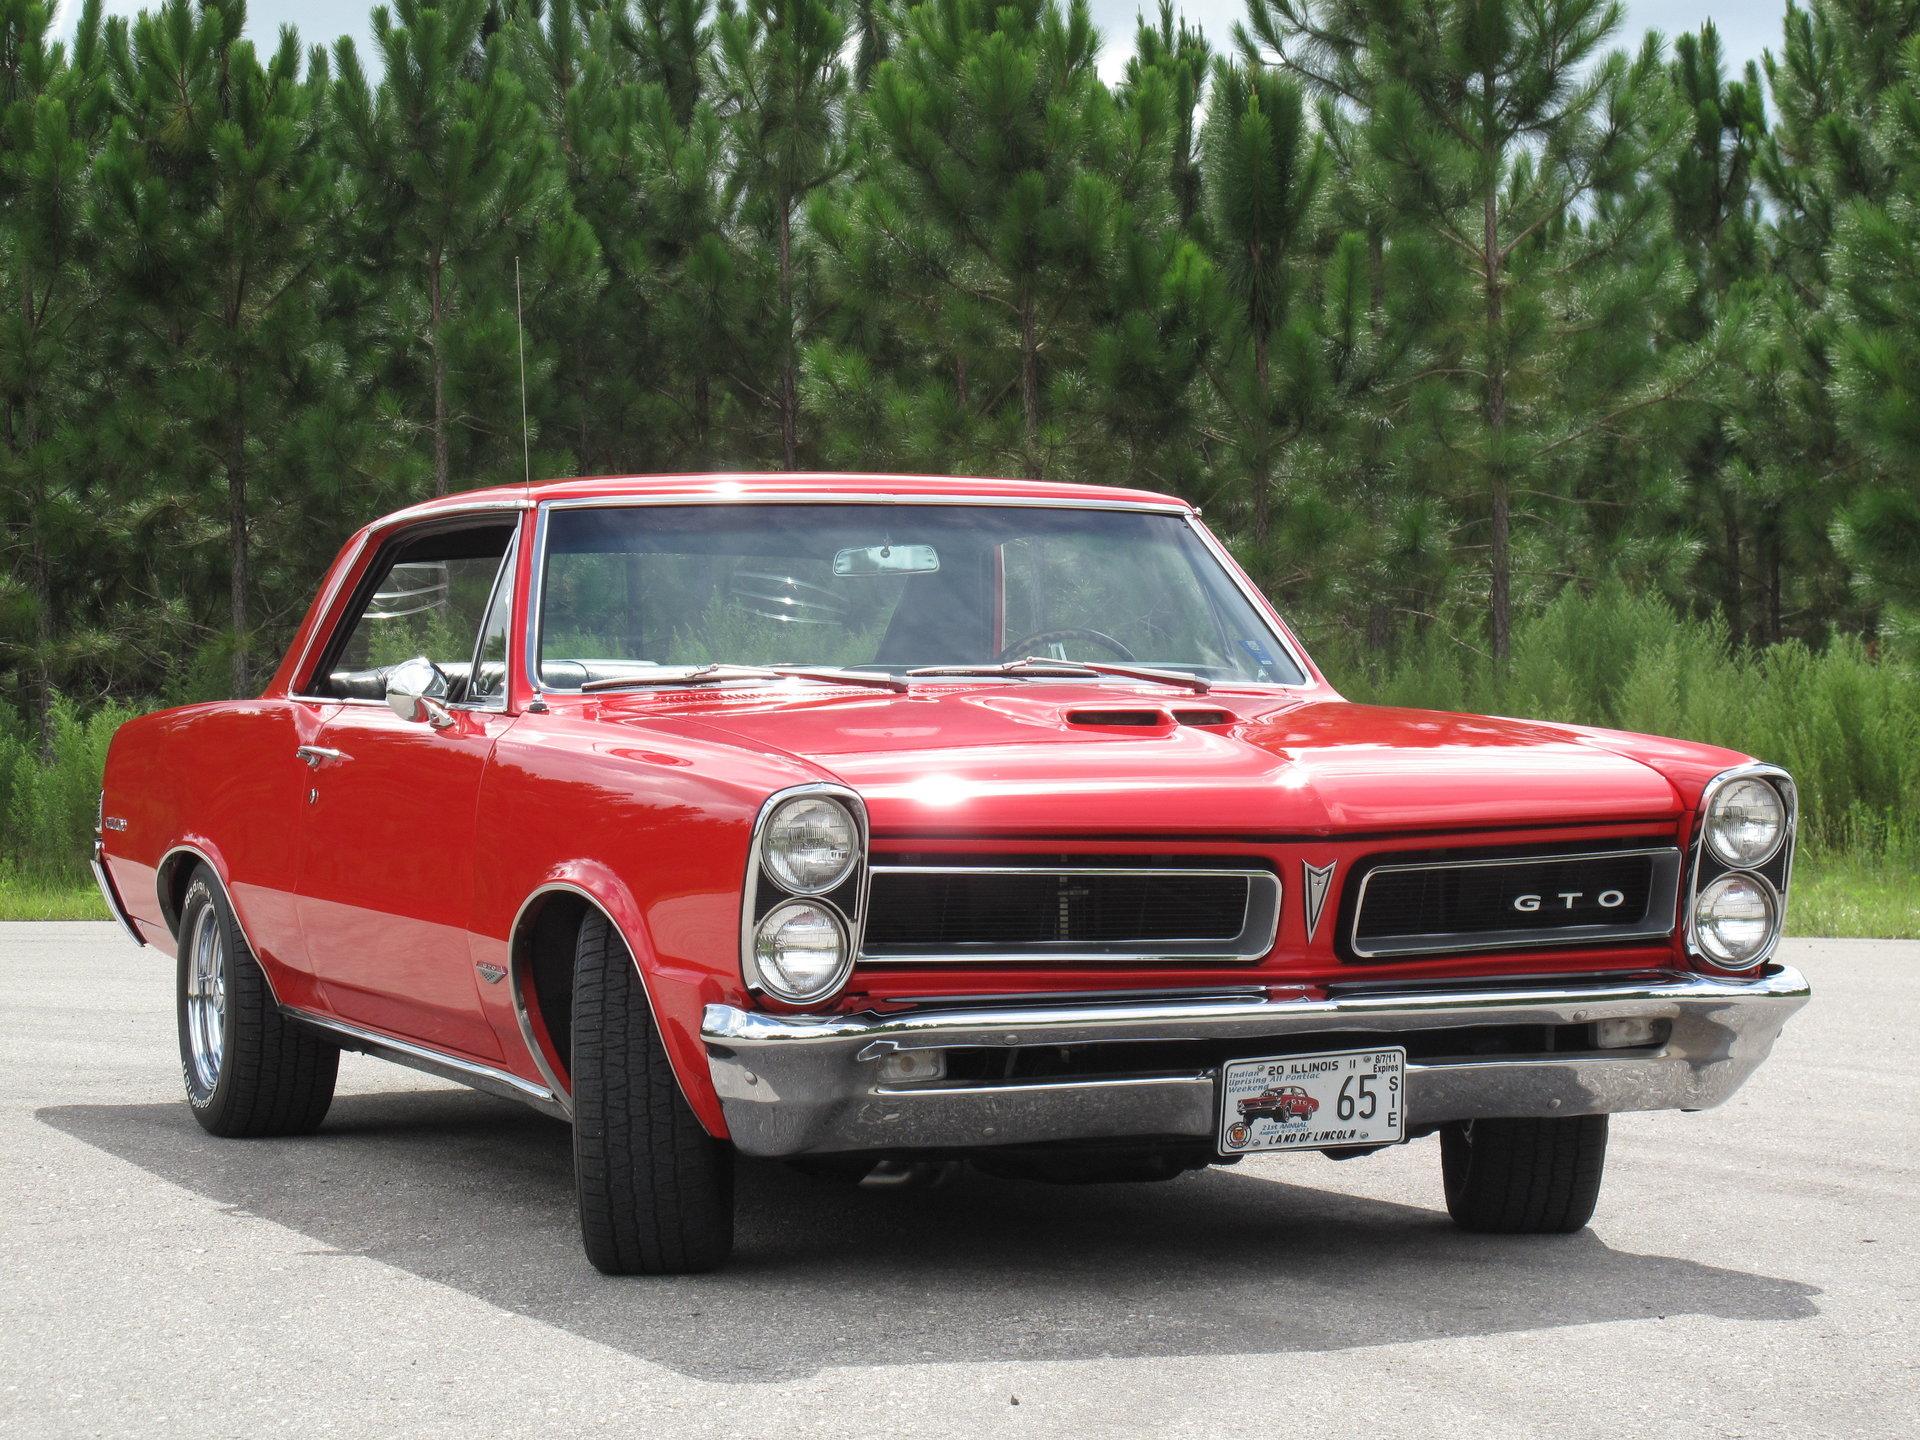 1965 Pontiac Gto For Sale 94389 Mcg March Serpentine